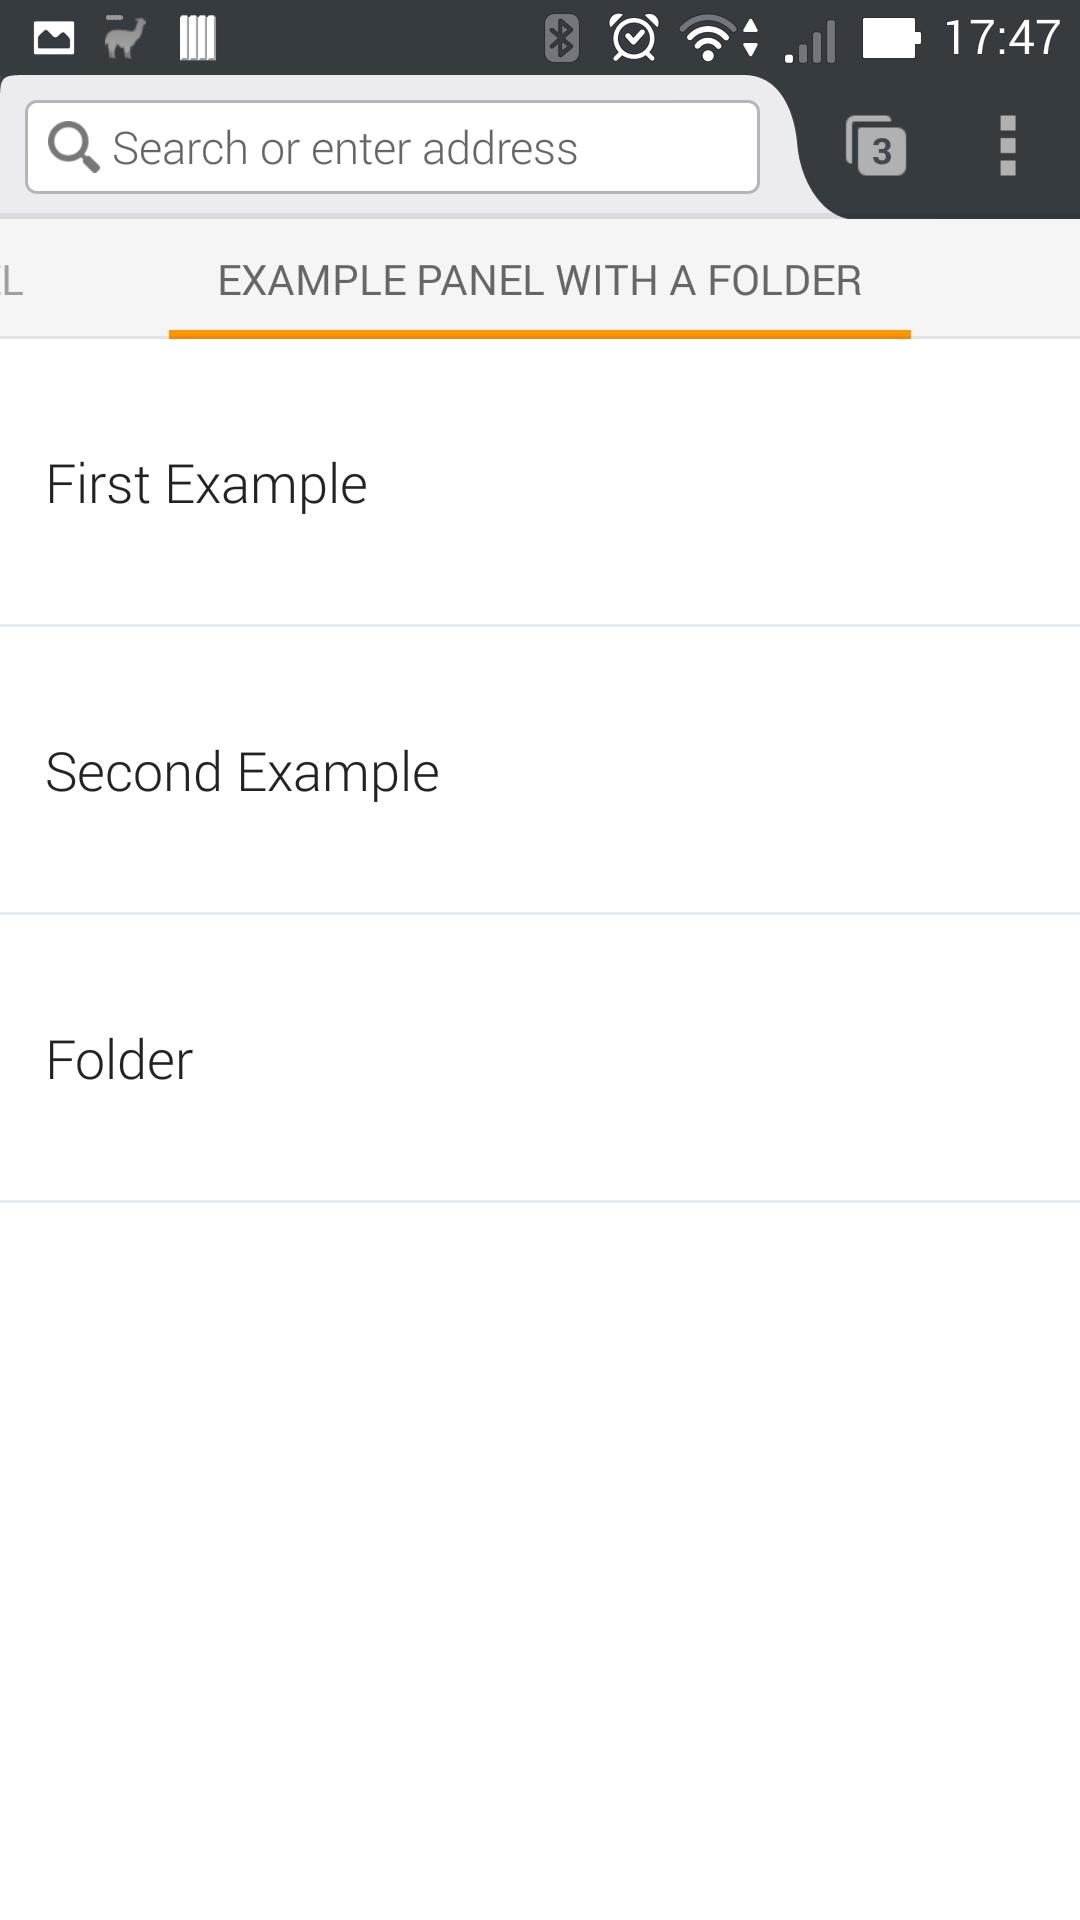 Folder Panel